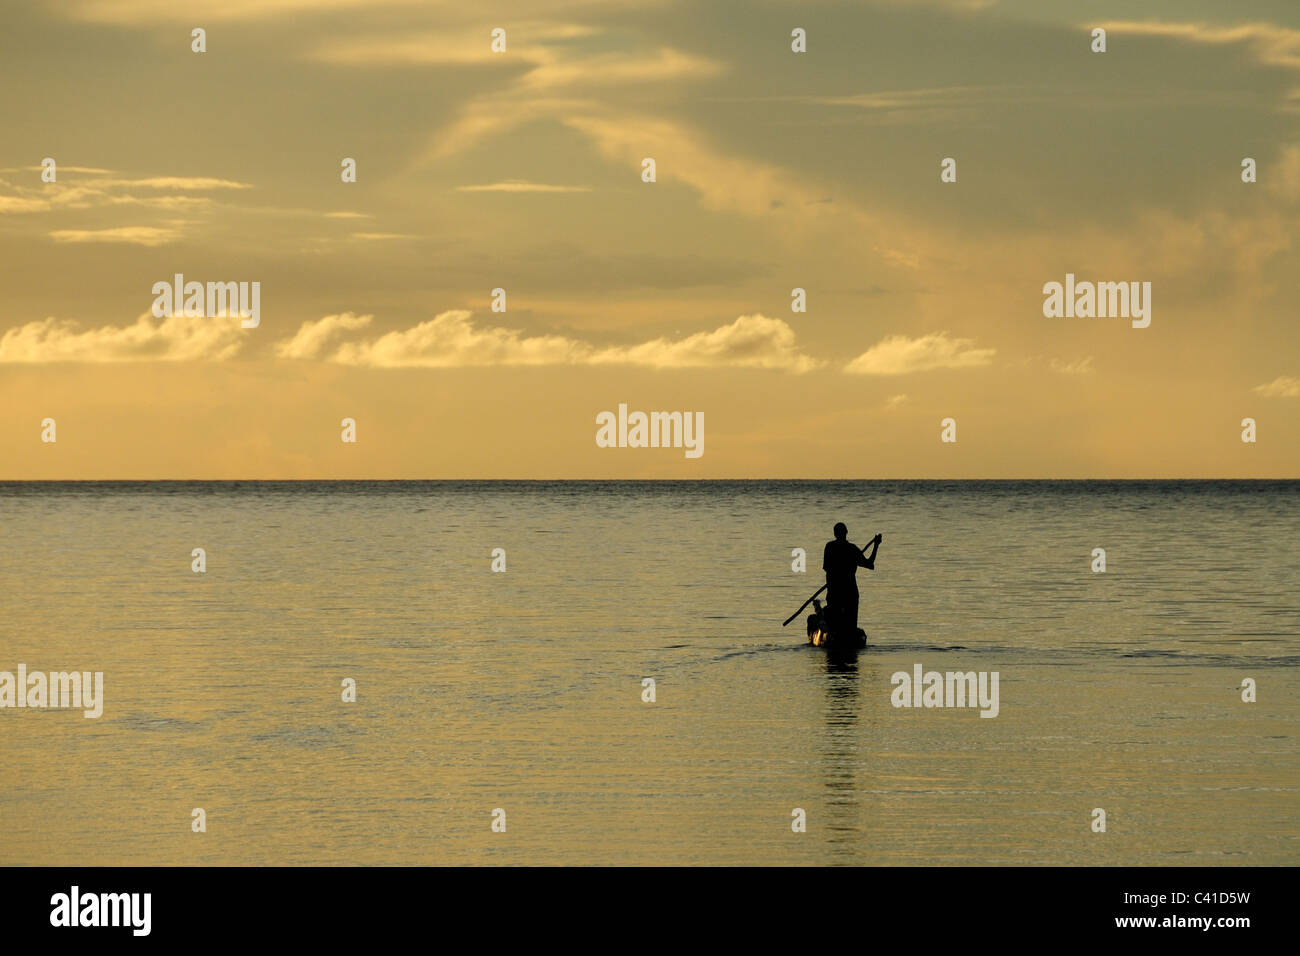 Fisherman punting a dugout canoe off the coast of Mafia Island, Tanzania - Stock Image